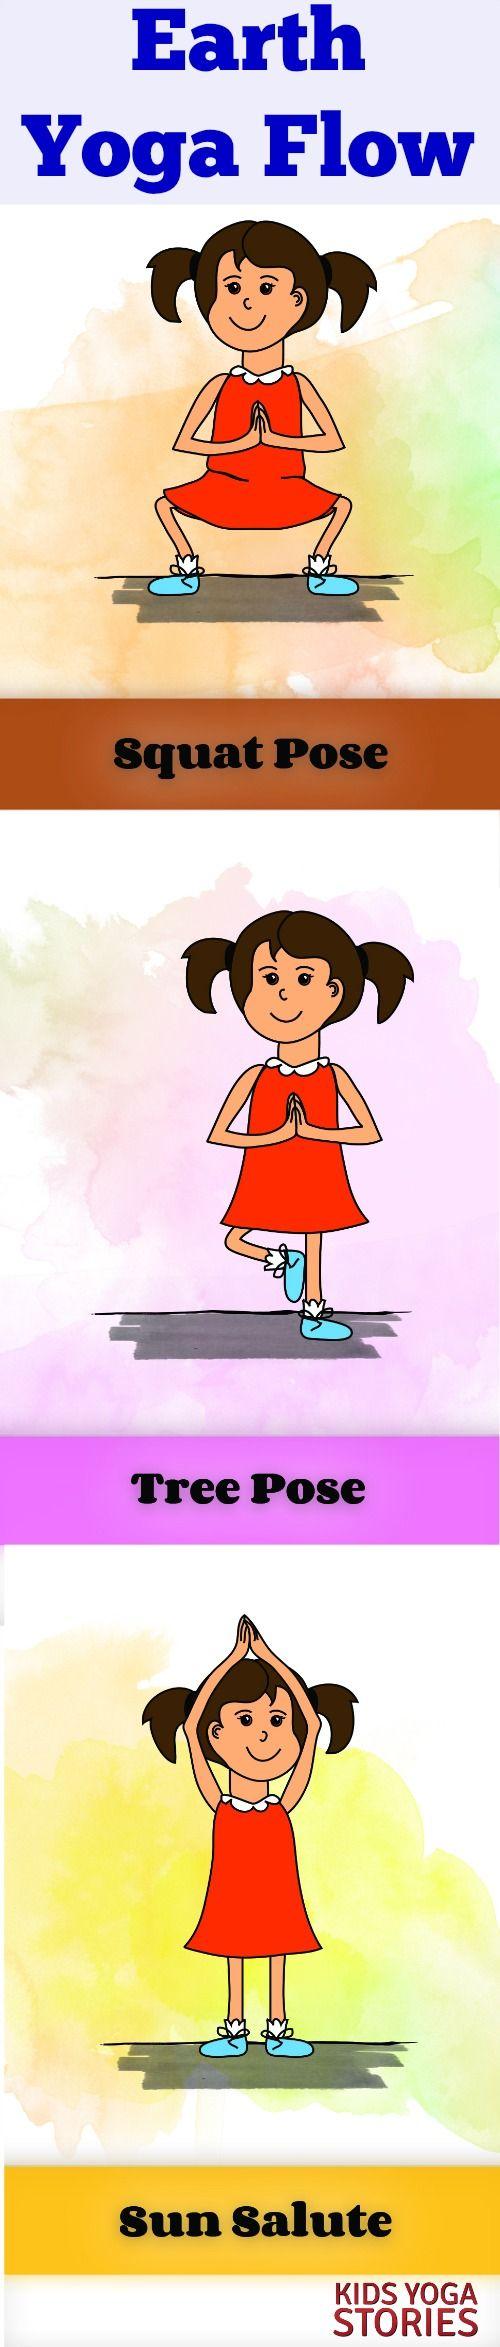 Earth Yoga 3-yoga pose flow | Kids Yoga Stories